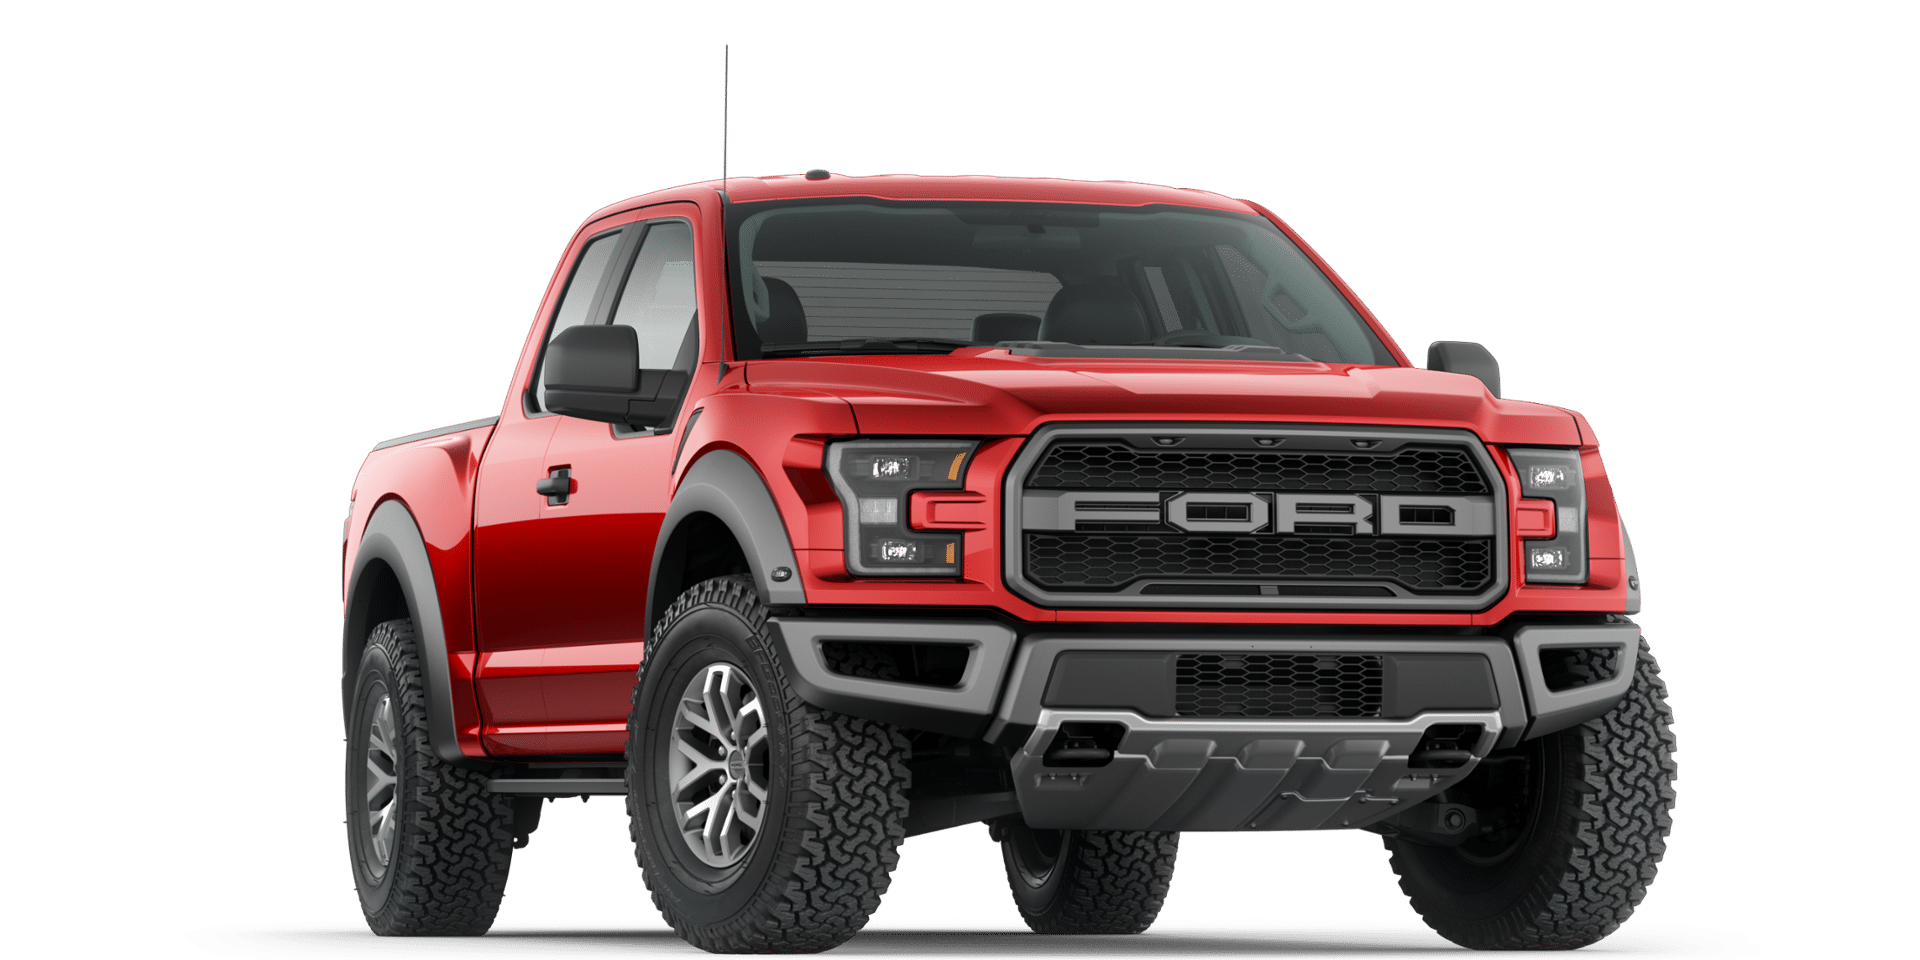 Mullinax Ford Olympia >> Mullinax Ford of Olympia | New Ford dealership in Olympia, WA 98501